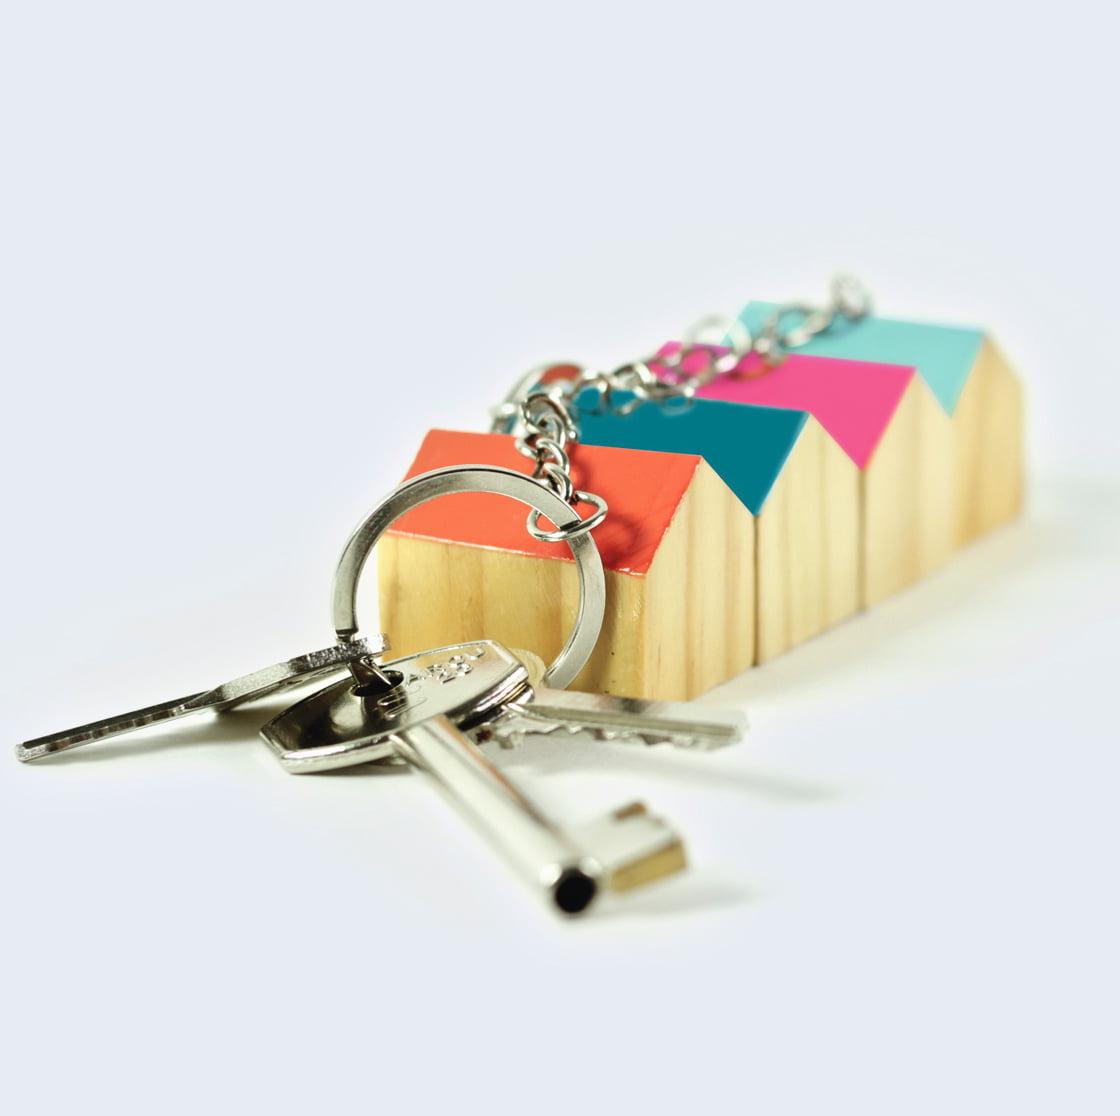 Home Sweet Home Keyring by DOIY